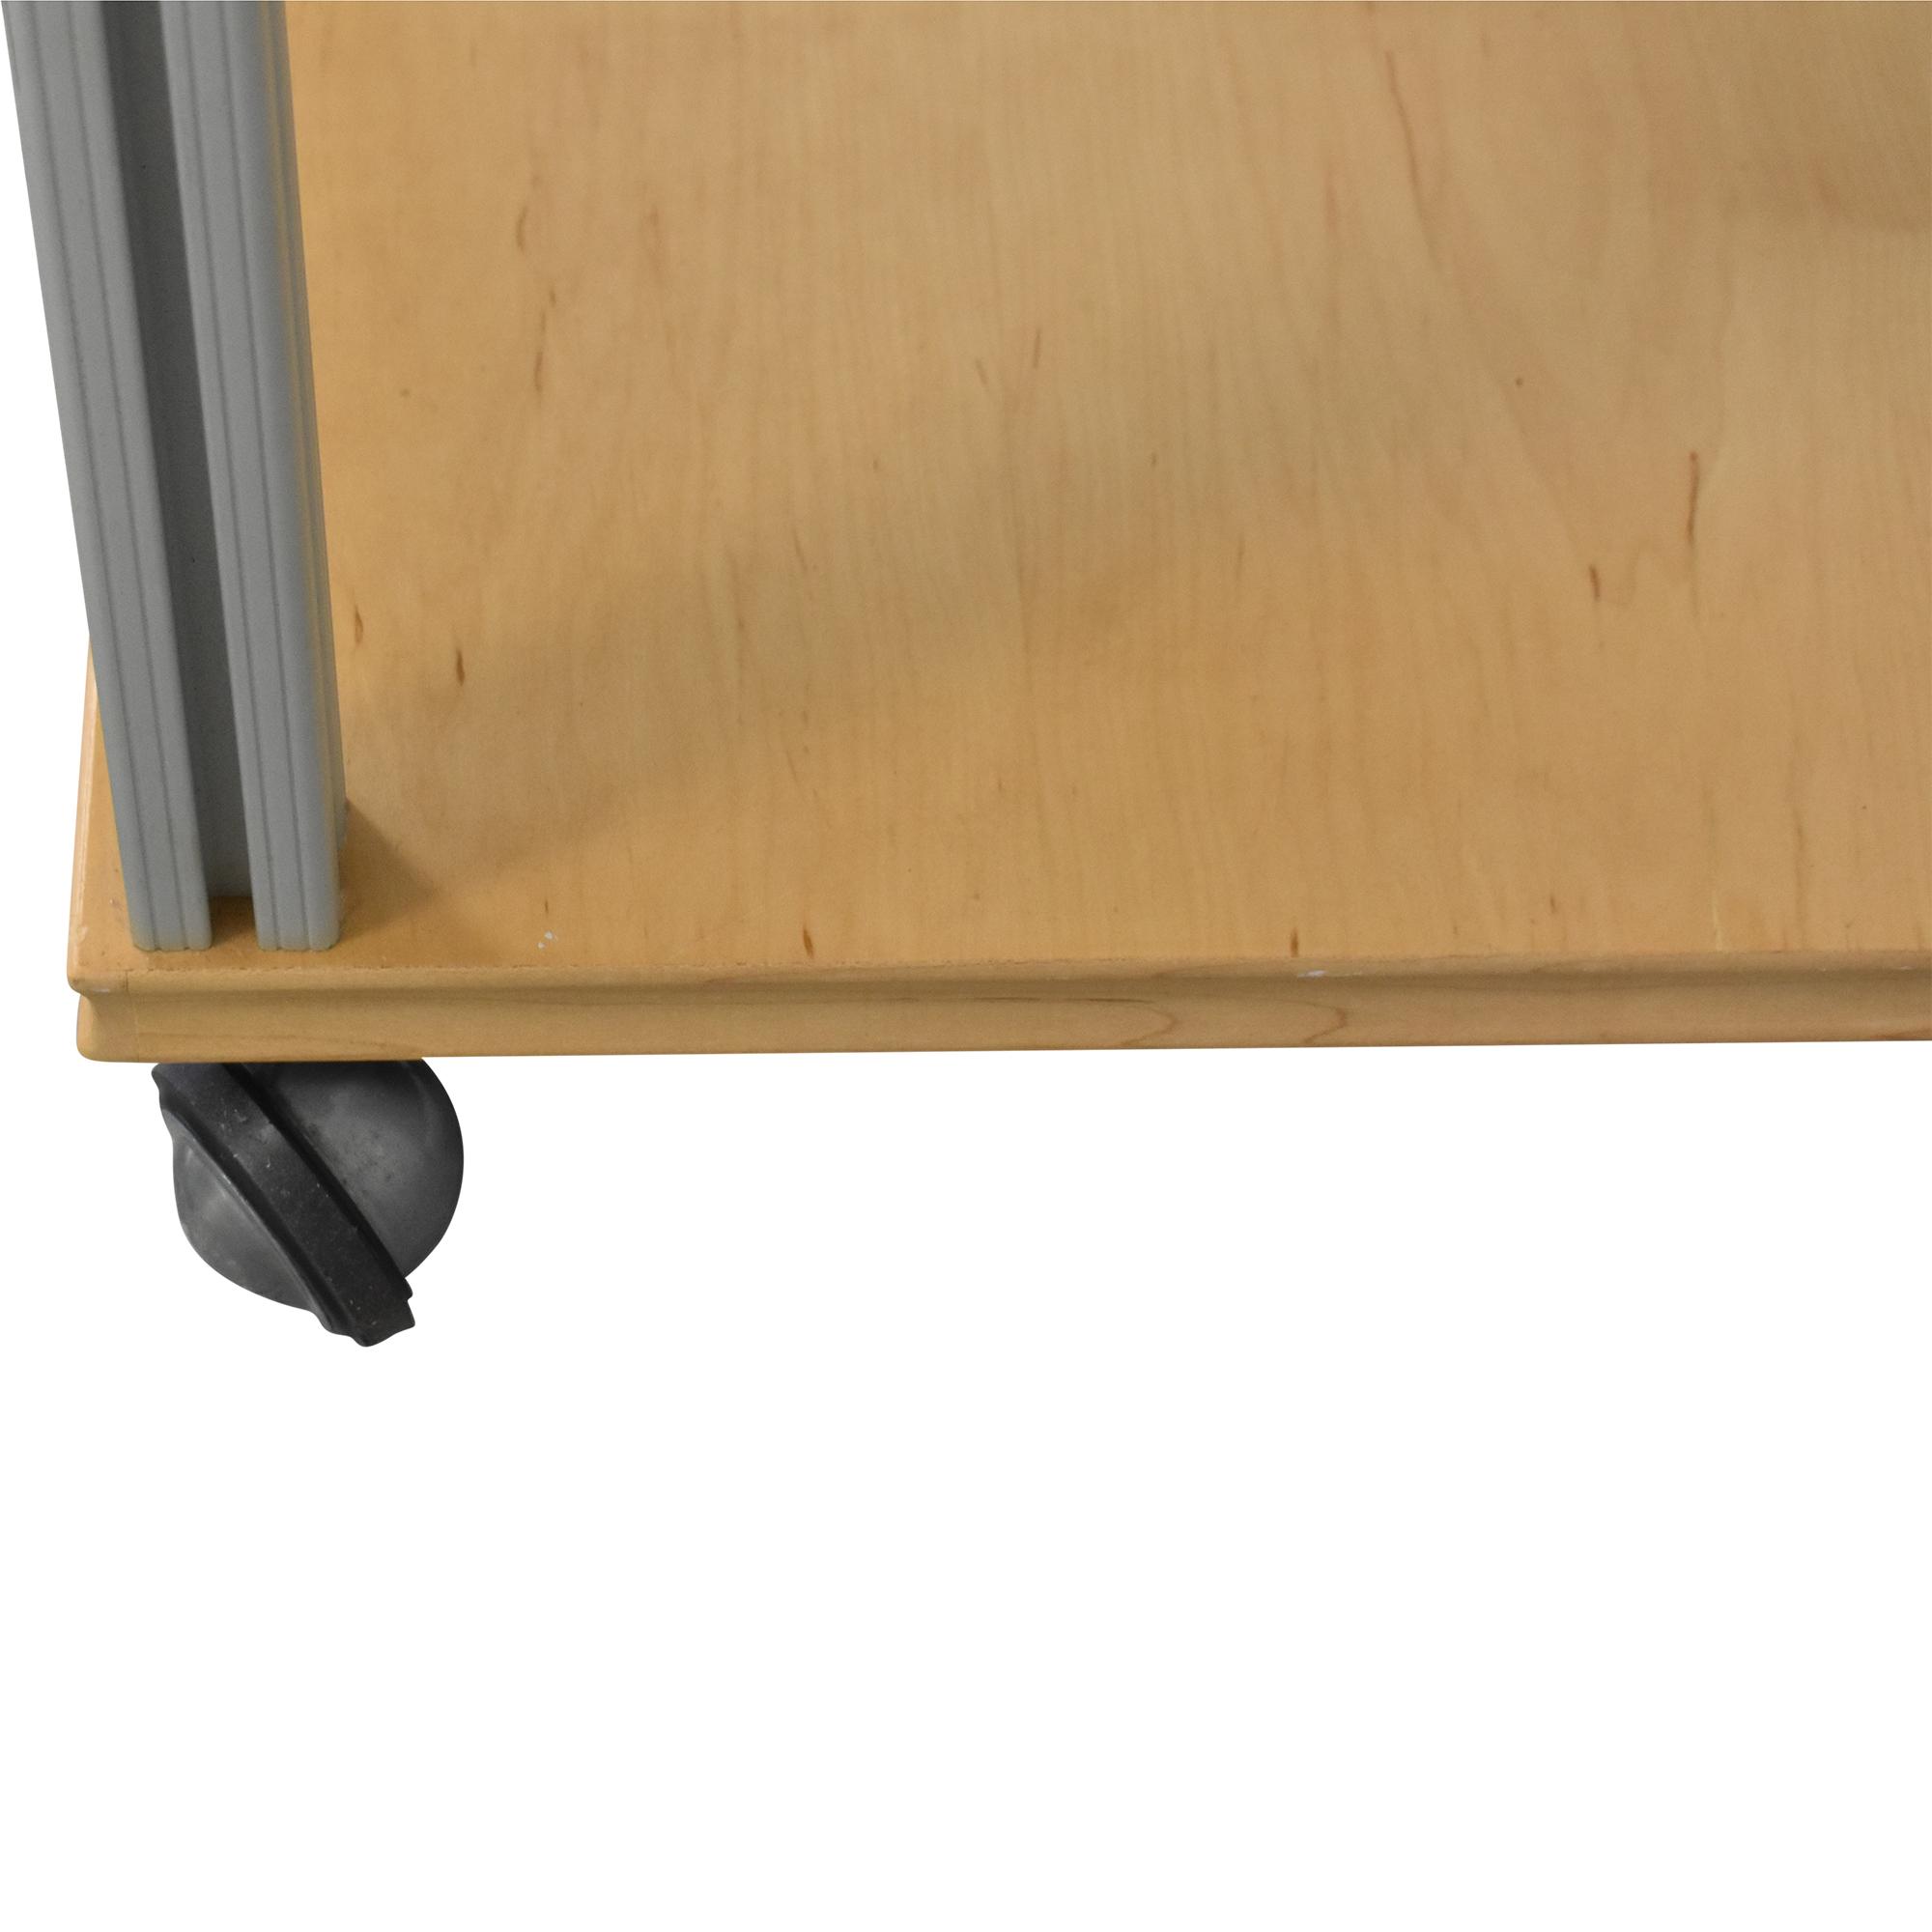 Salamander Designs Synergy Shelving Unit on Castors / Tables